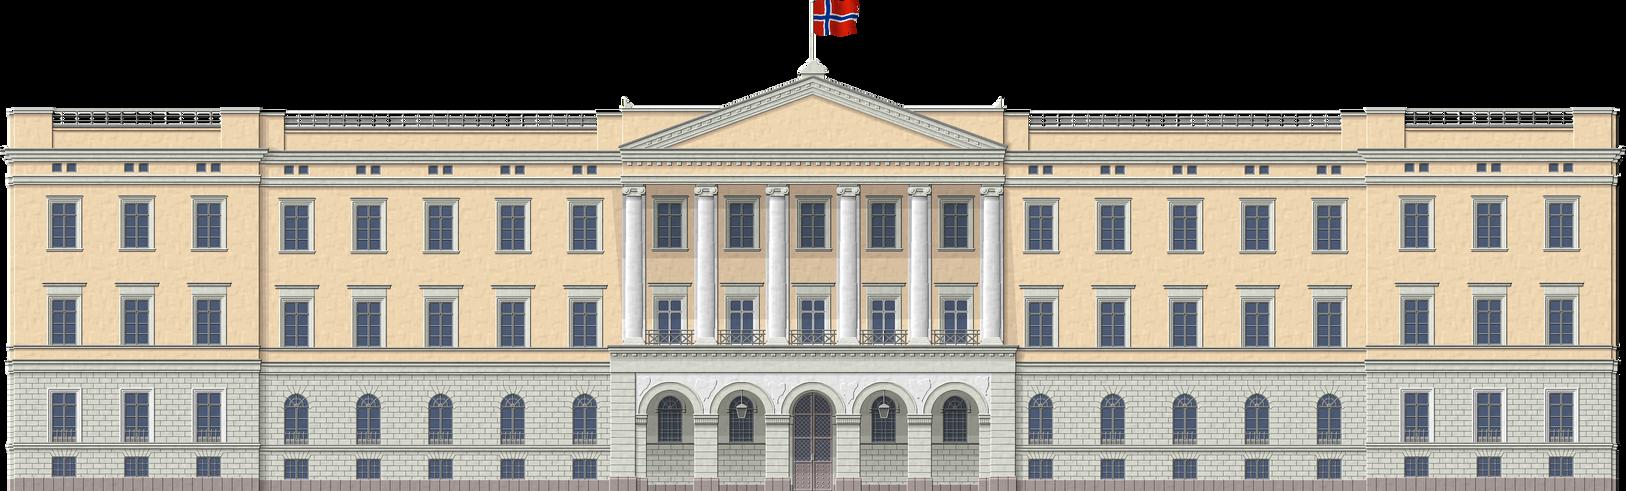 Oslo Royal Palace by Herbertrocha